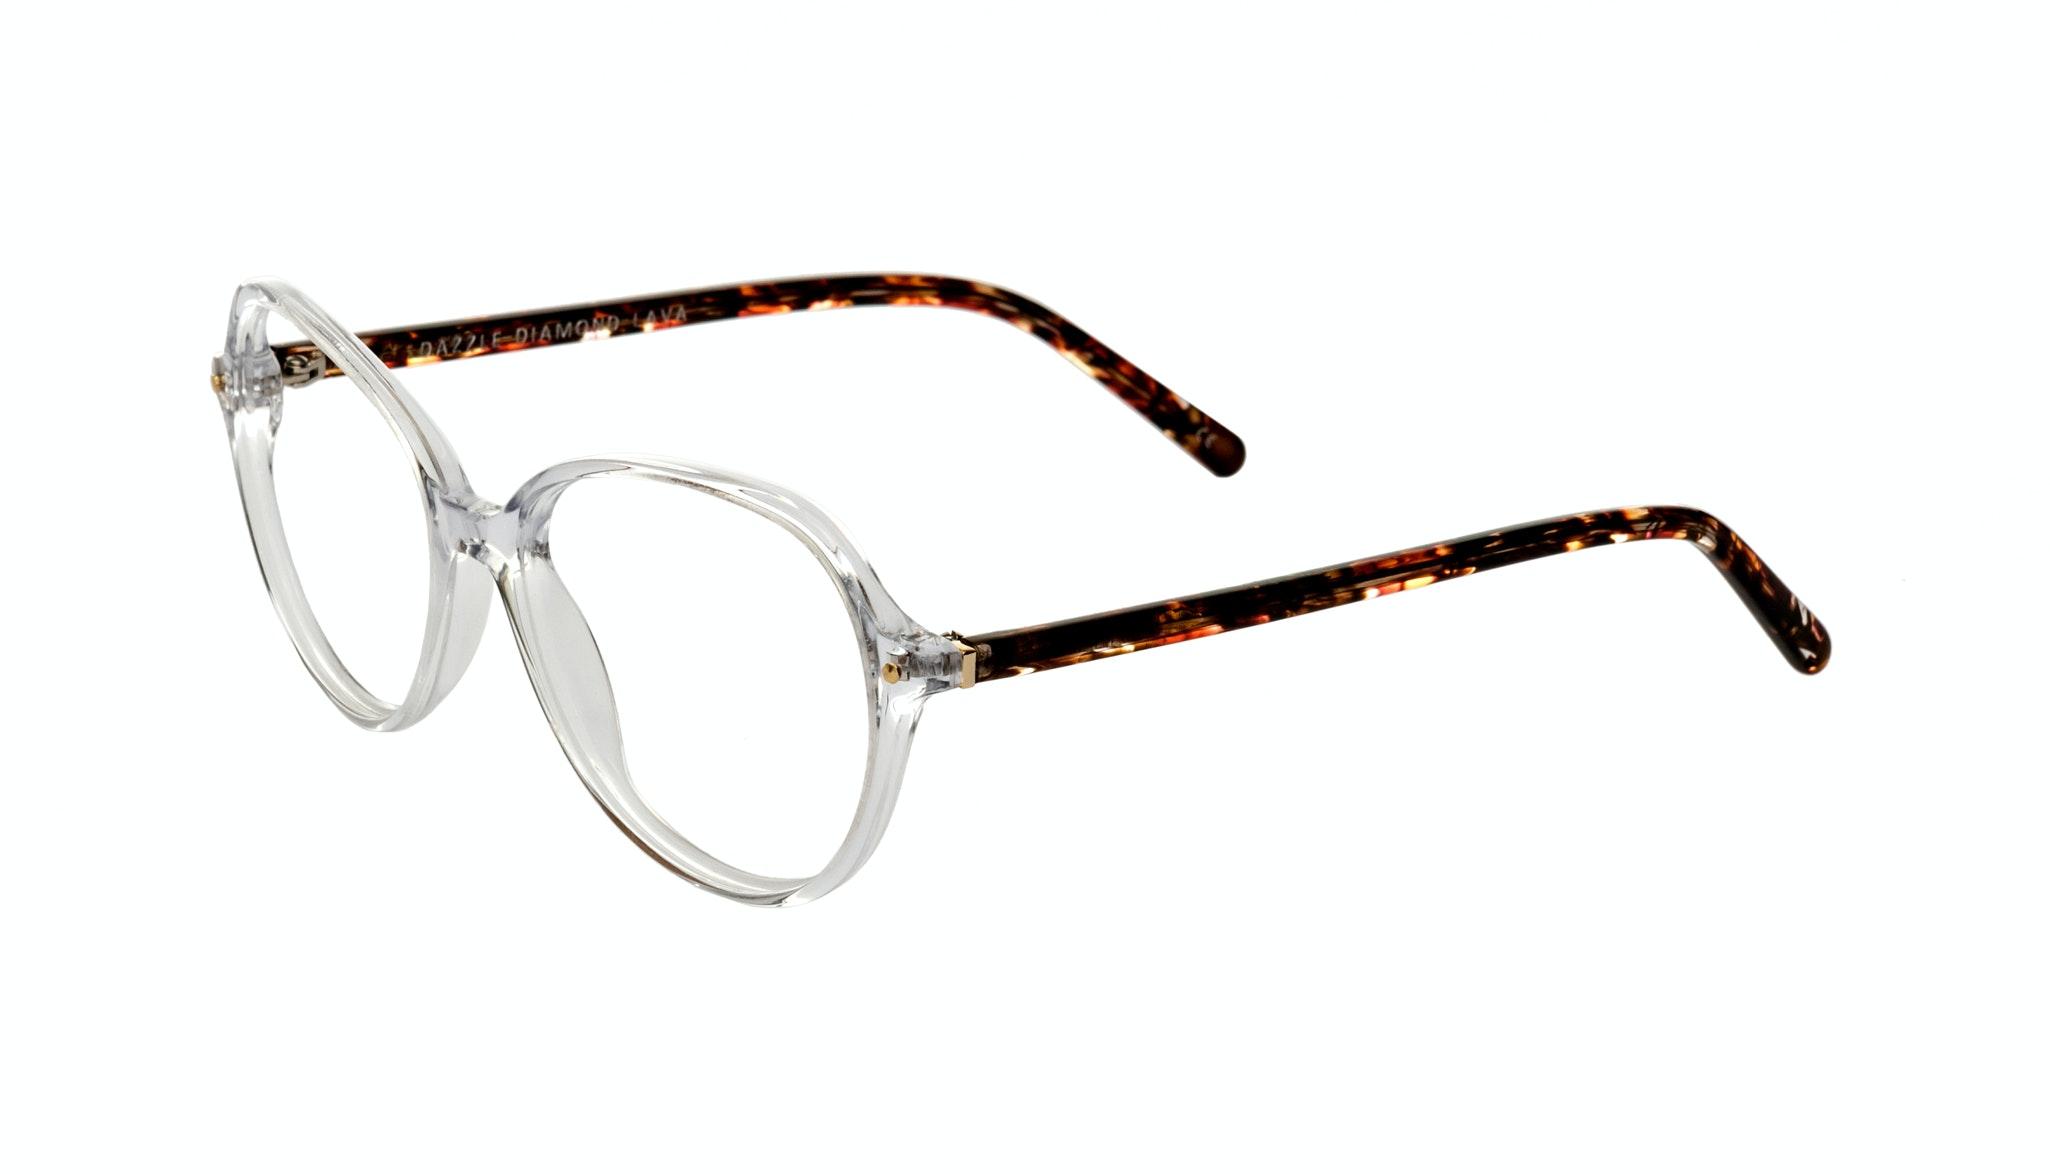 Affordable Fashion Glasses Round Eyeglasses Women Dazzle Diamond Lava Tilt